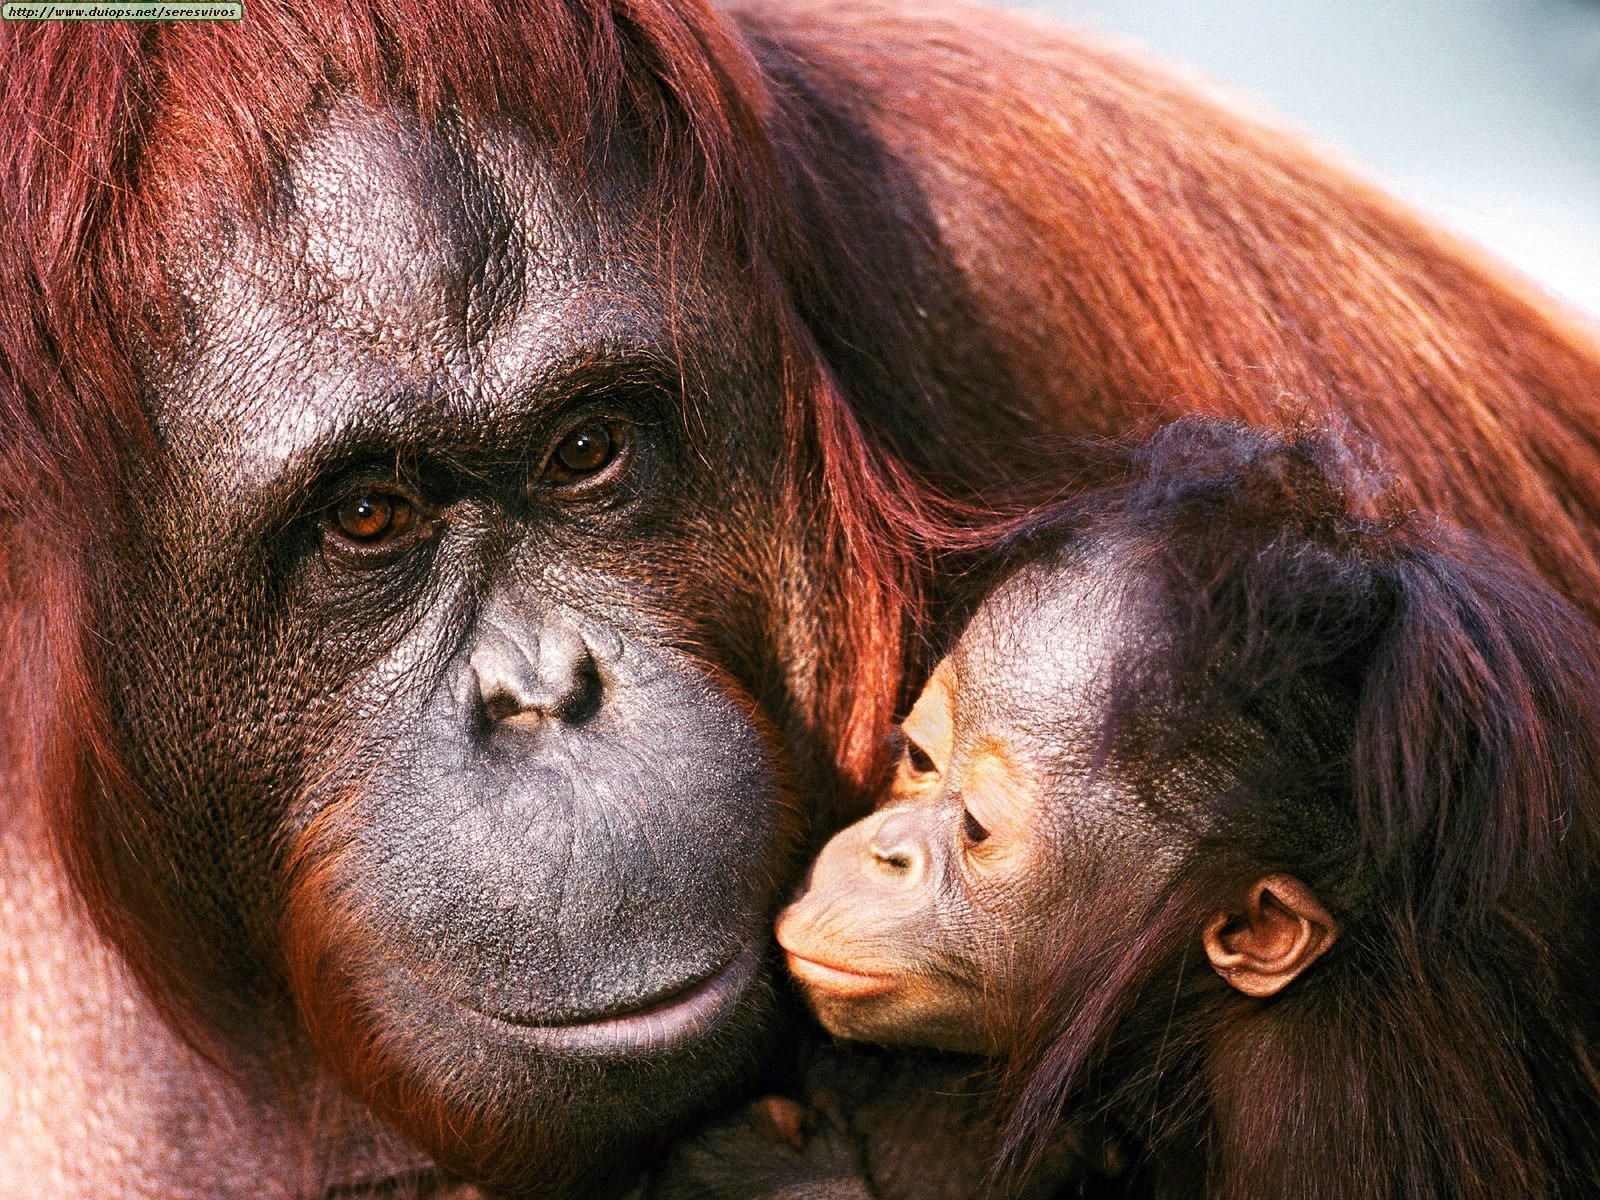 http://www.duiops.net/seresvivos/galeria/orangutanes/Female%20Sumatran%20Orangutan%20and%20Baby.jpg